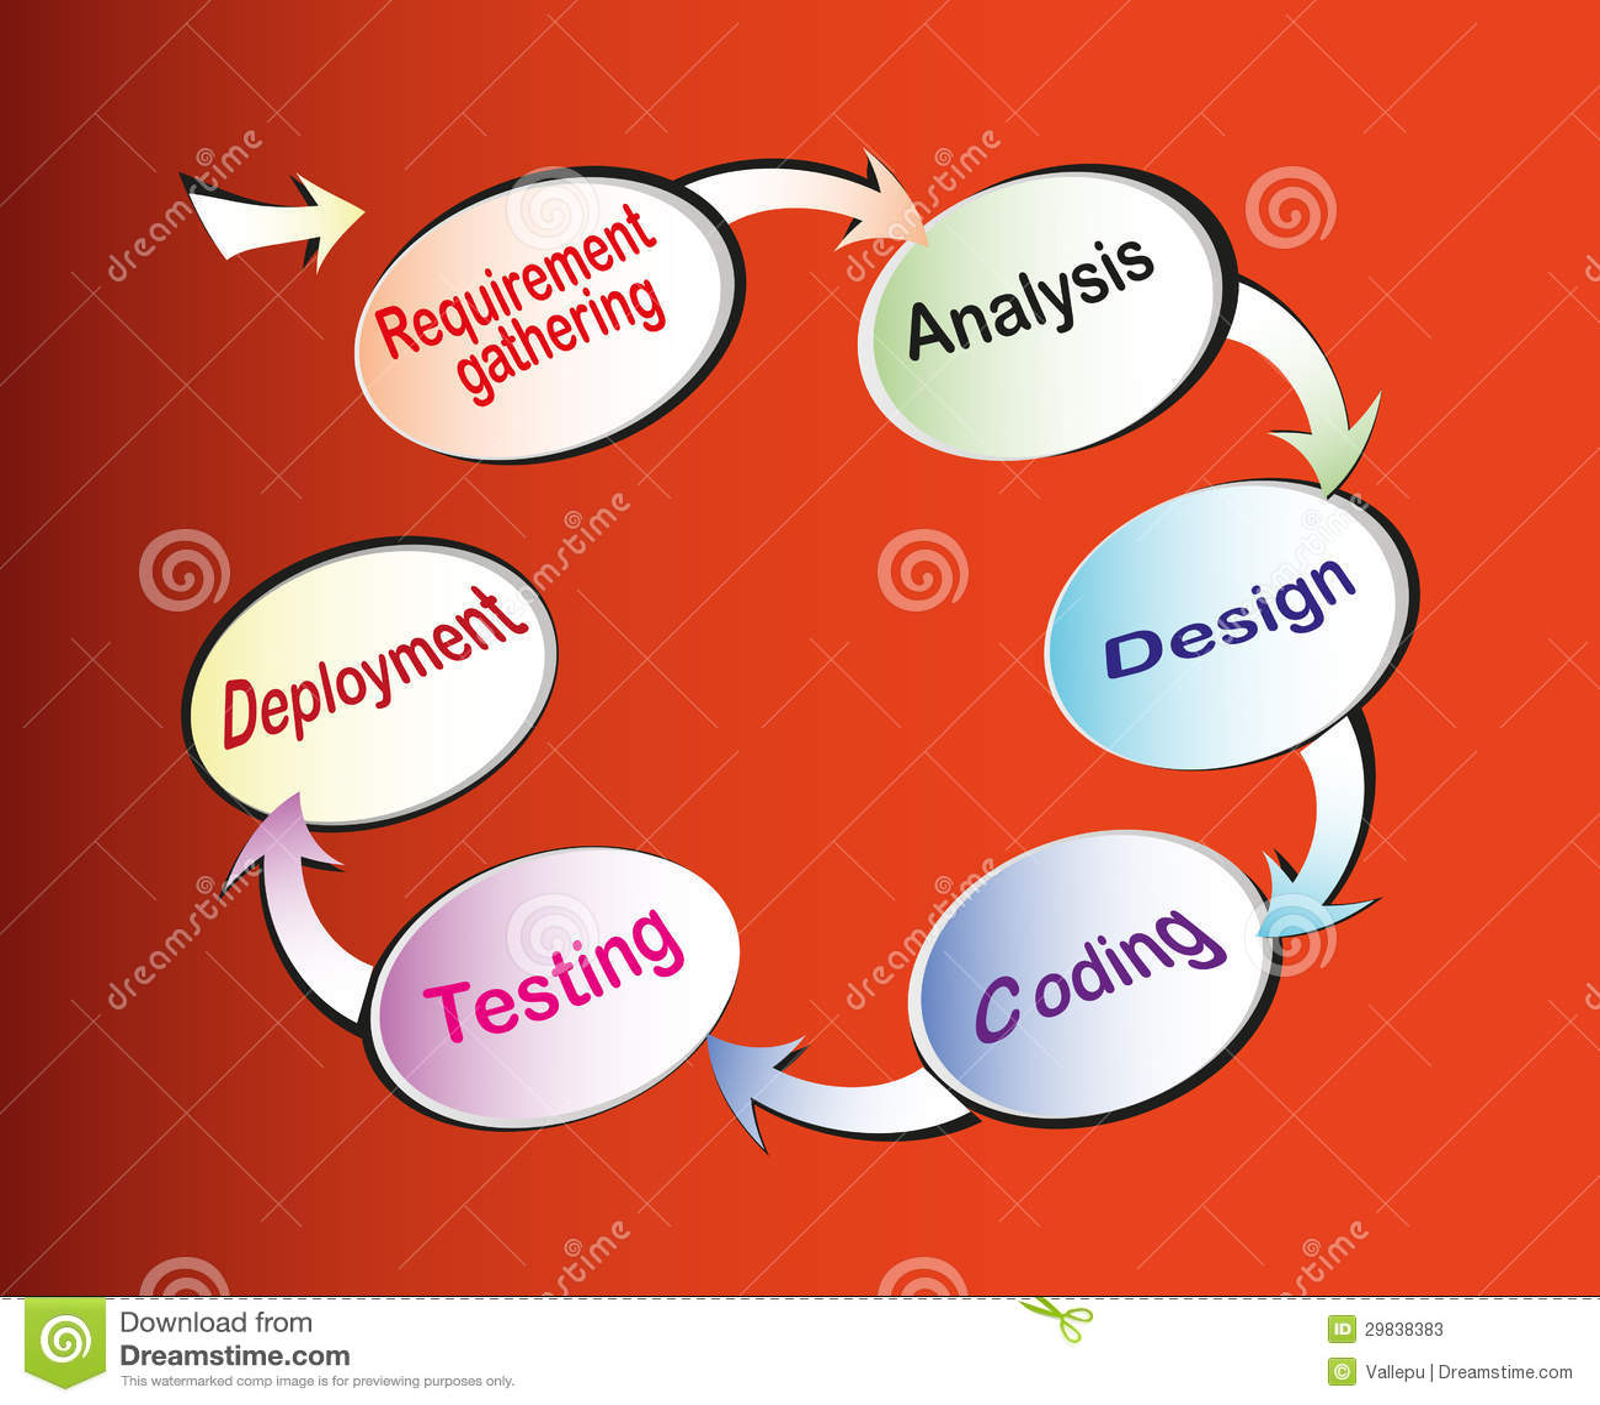 Technological advancement in an organization